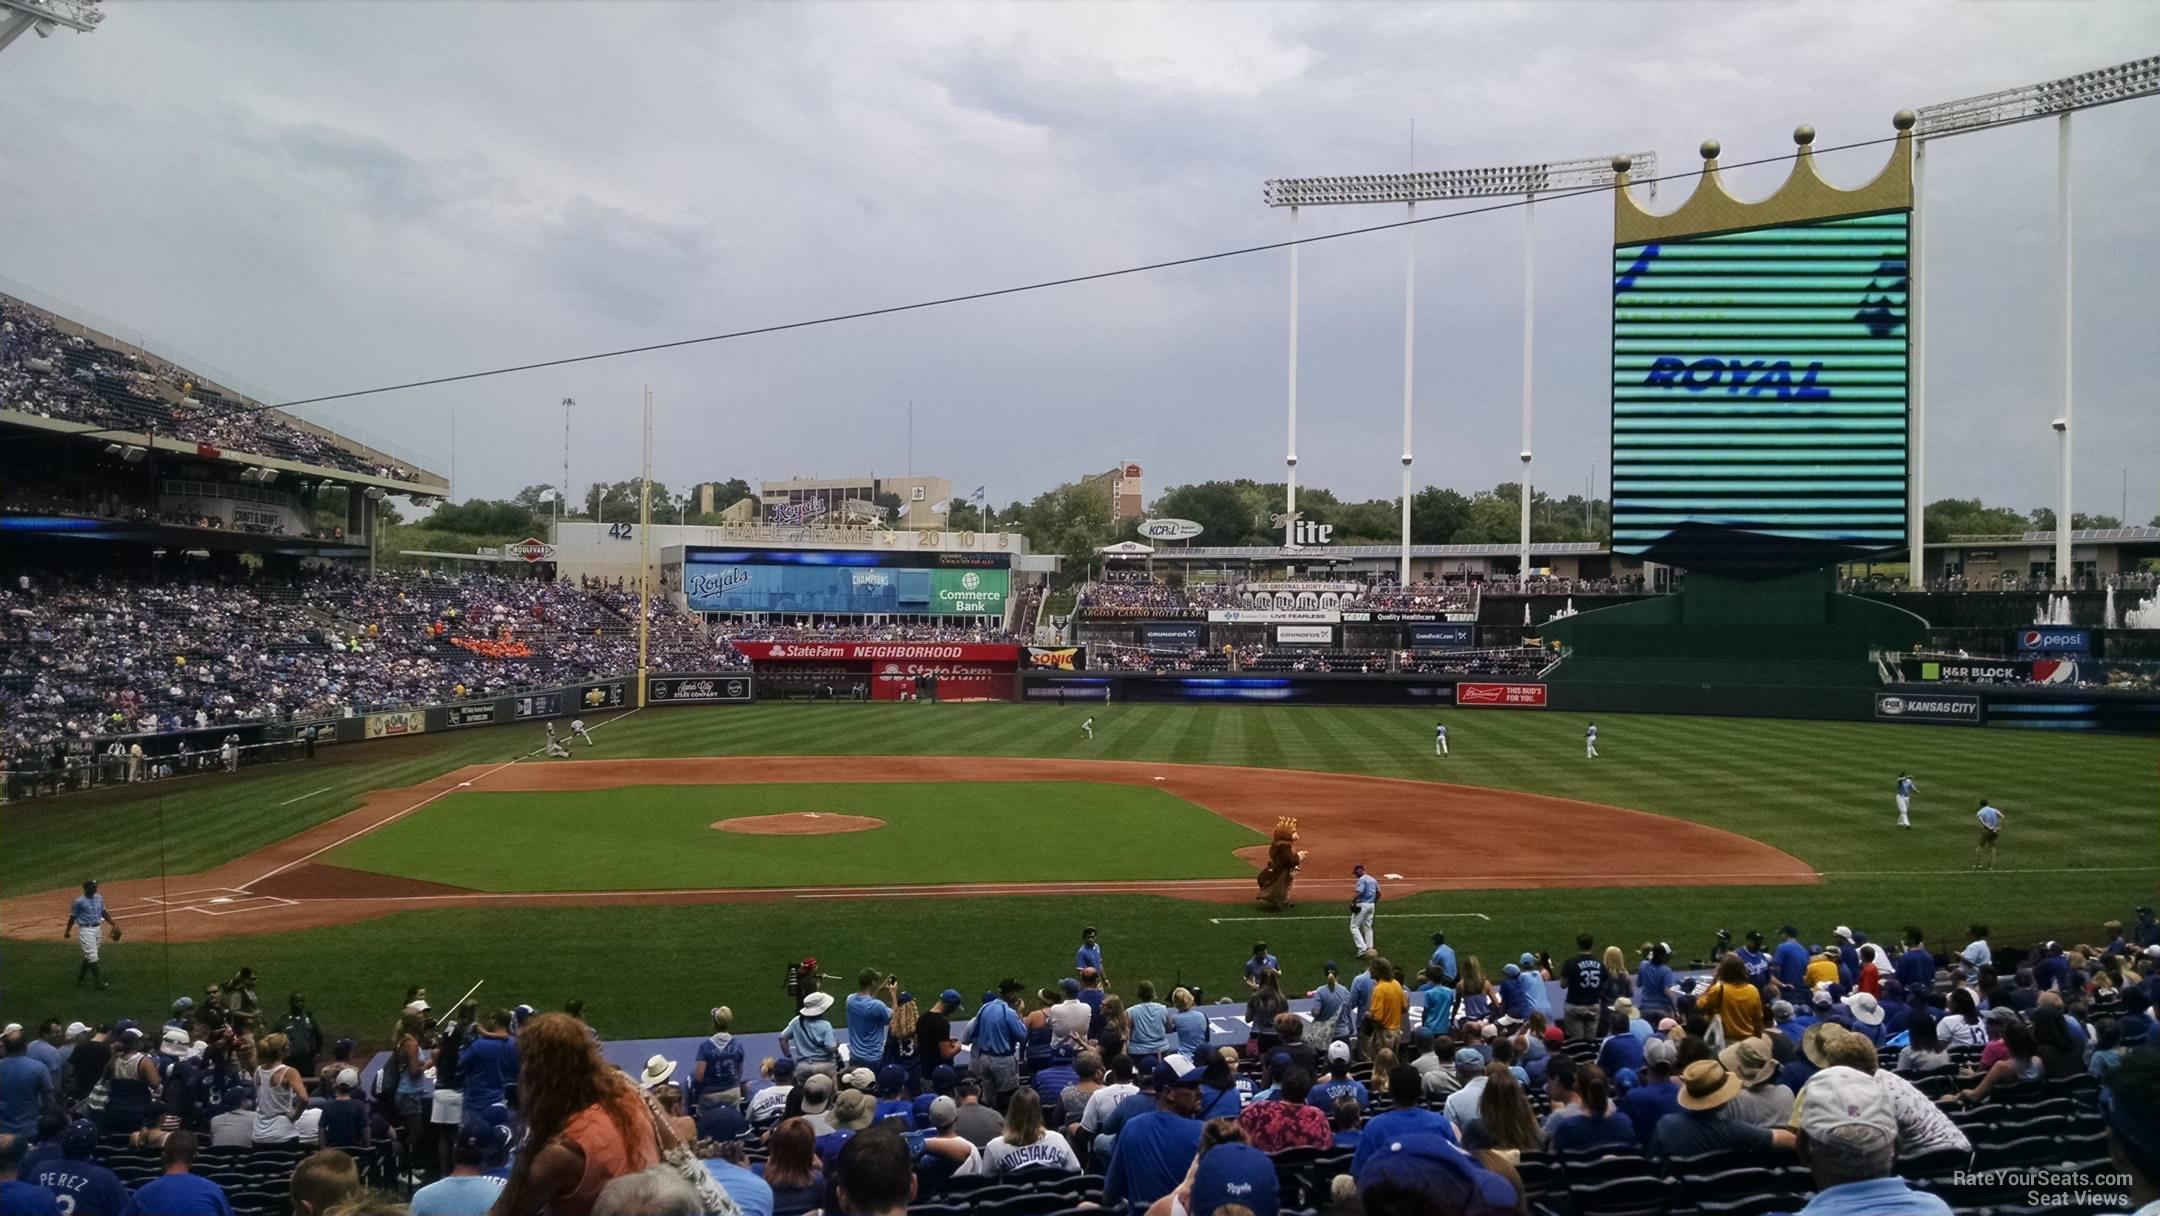 Kauffman Stadium Section 133 - RateYourSeats.com